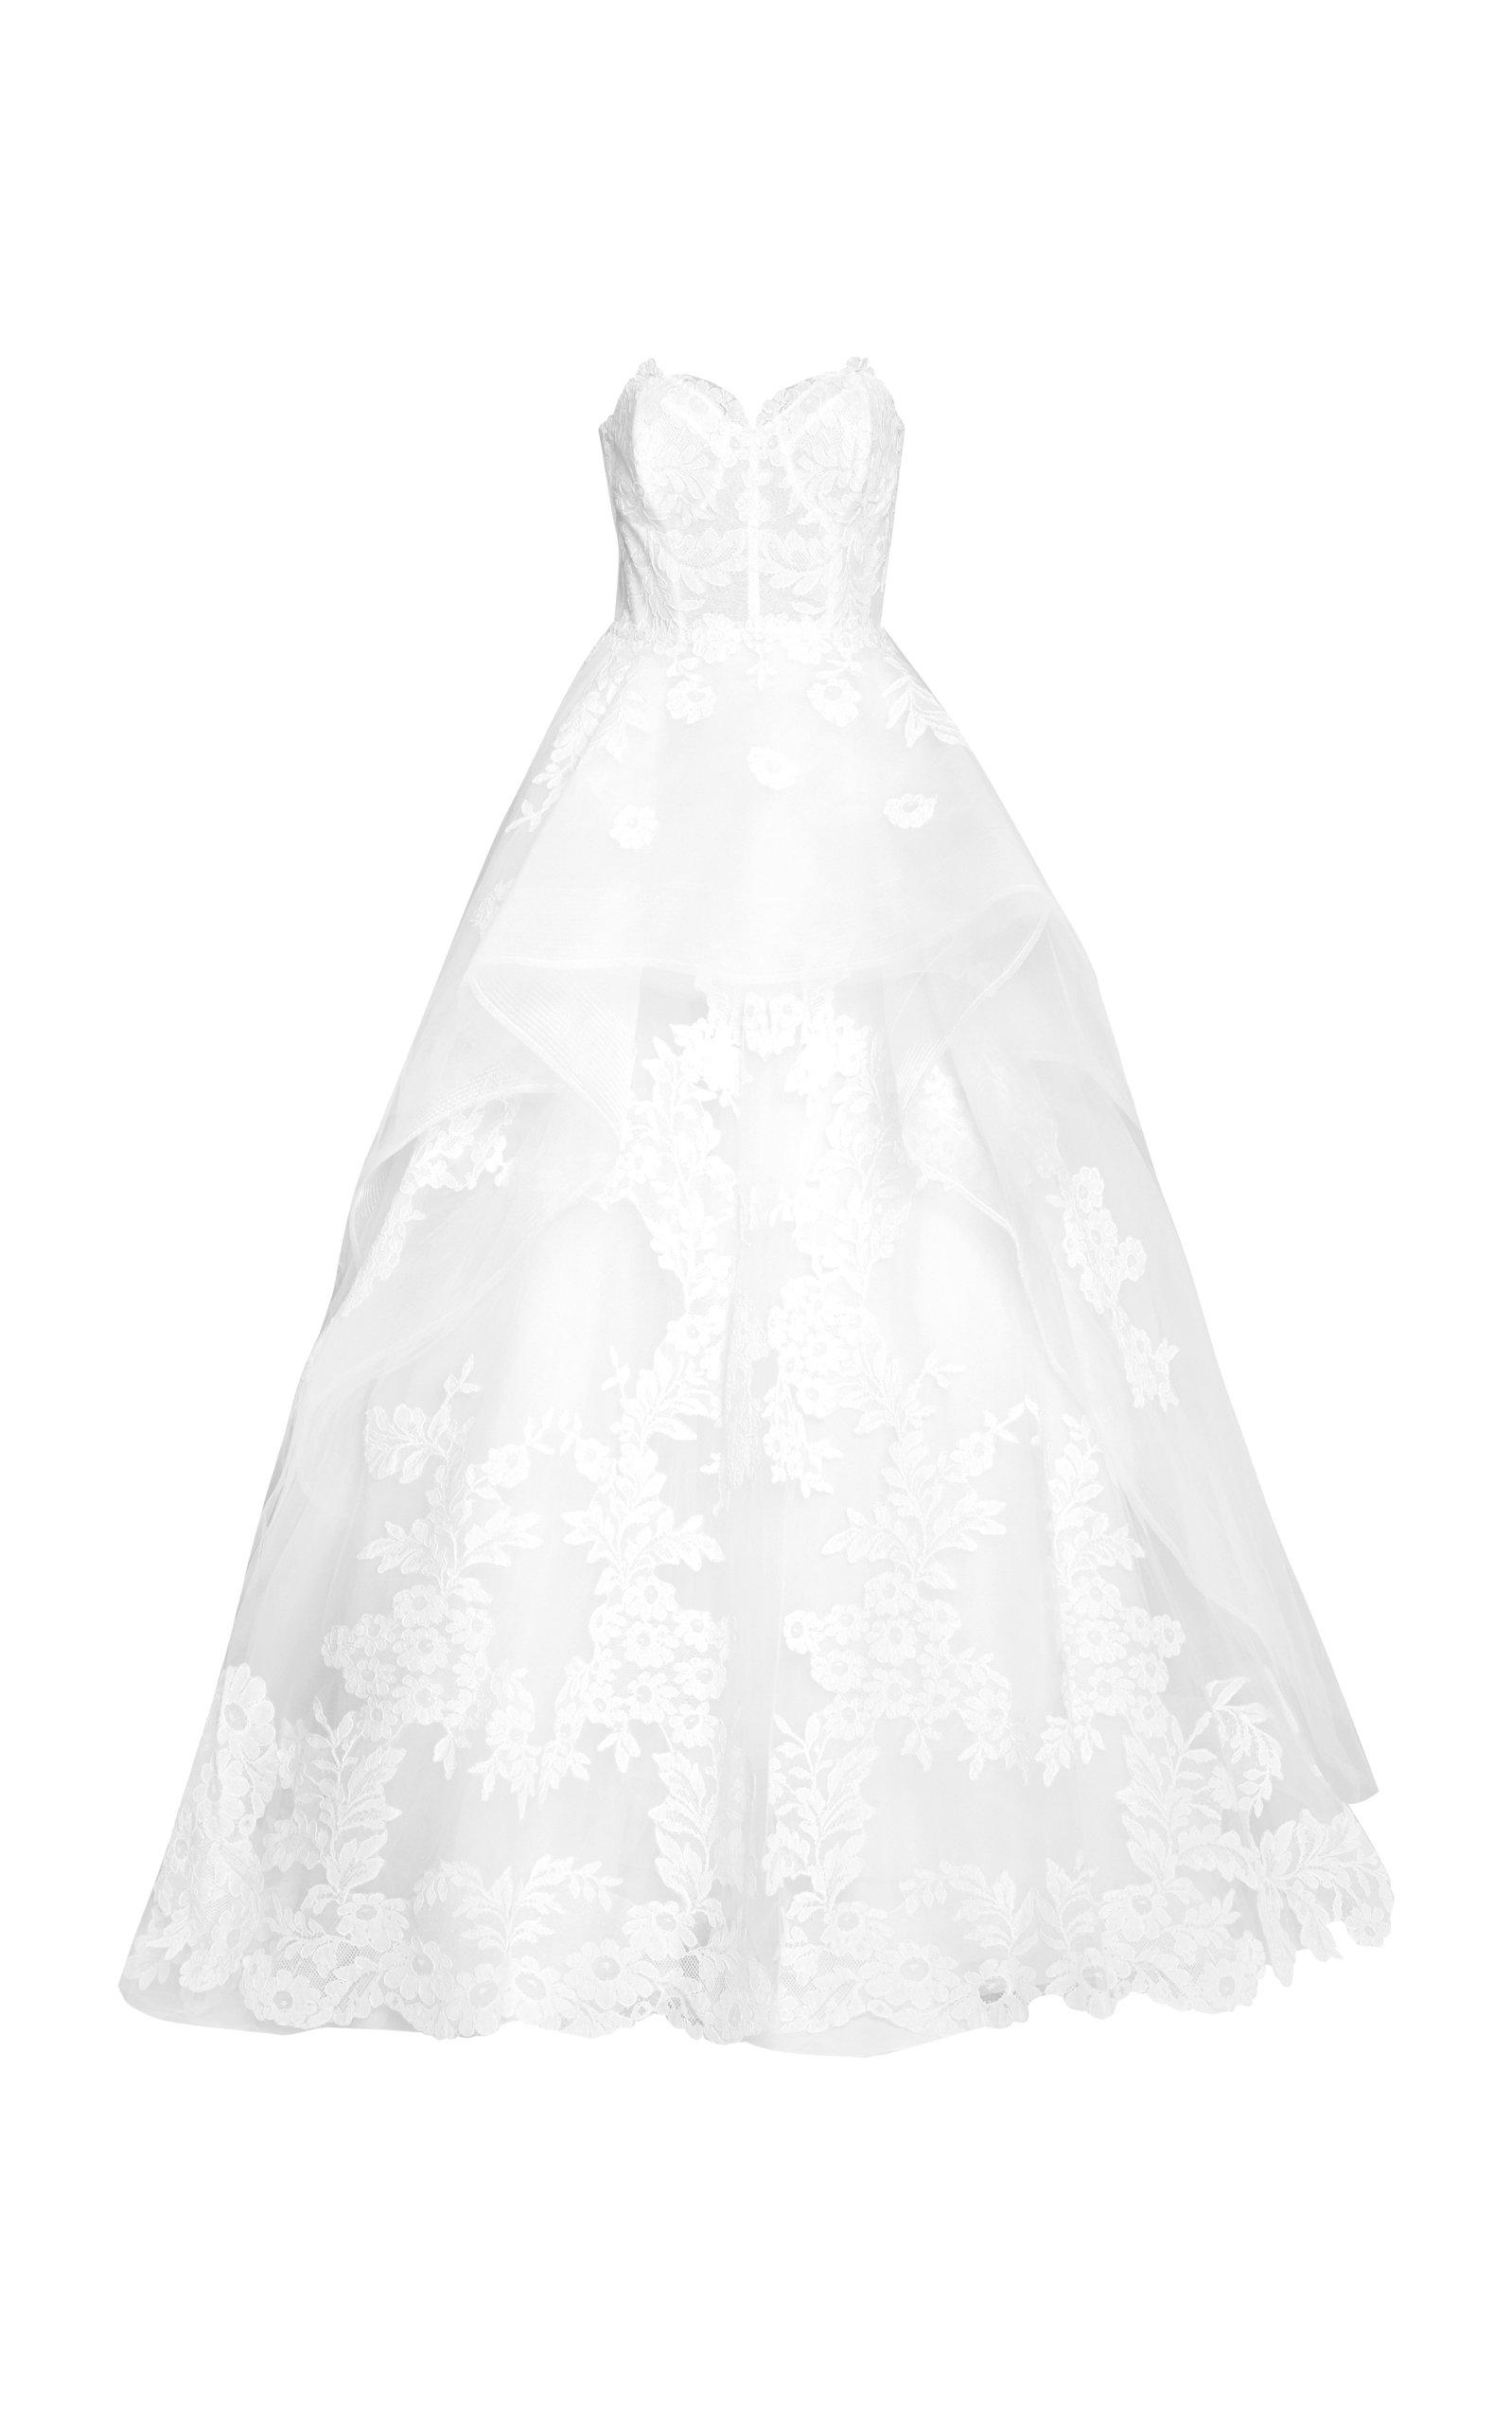 Carolina Herrera – Women's The Adeline Floral-Embroidered Gown – White – Moda Operandi